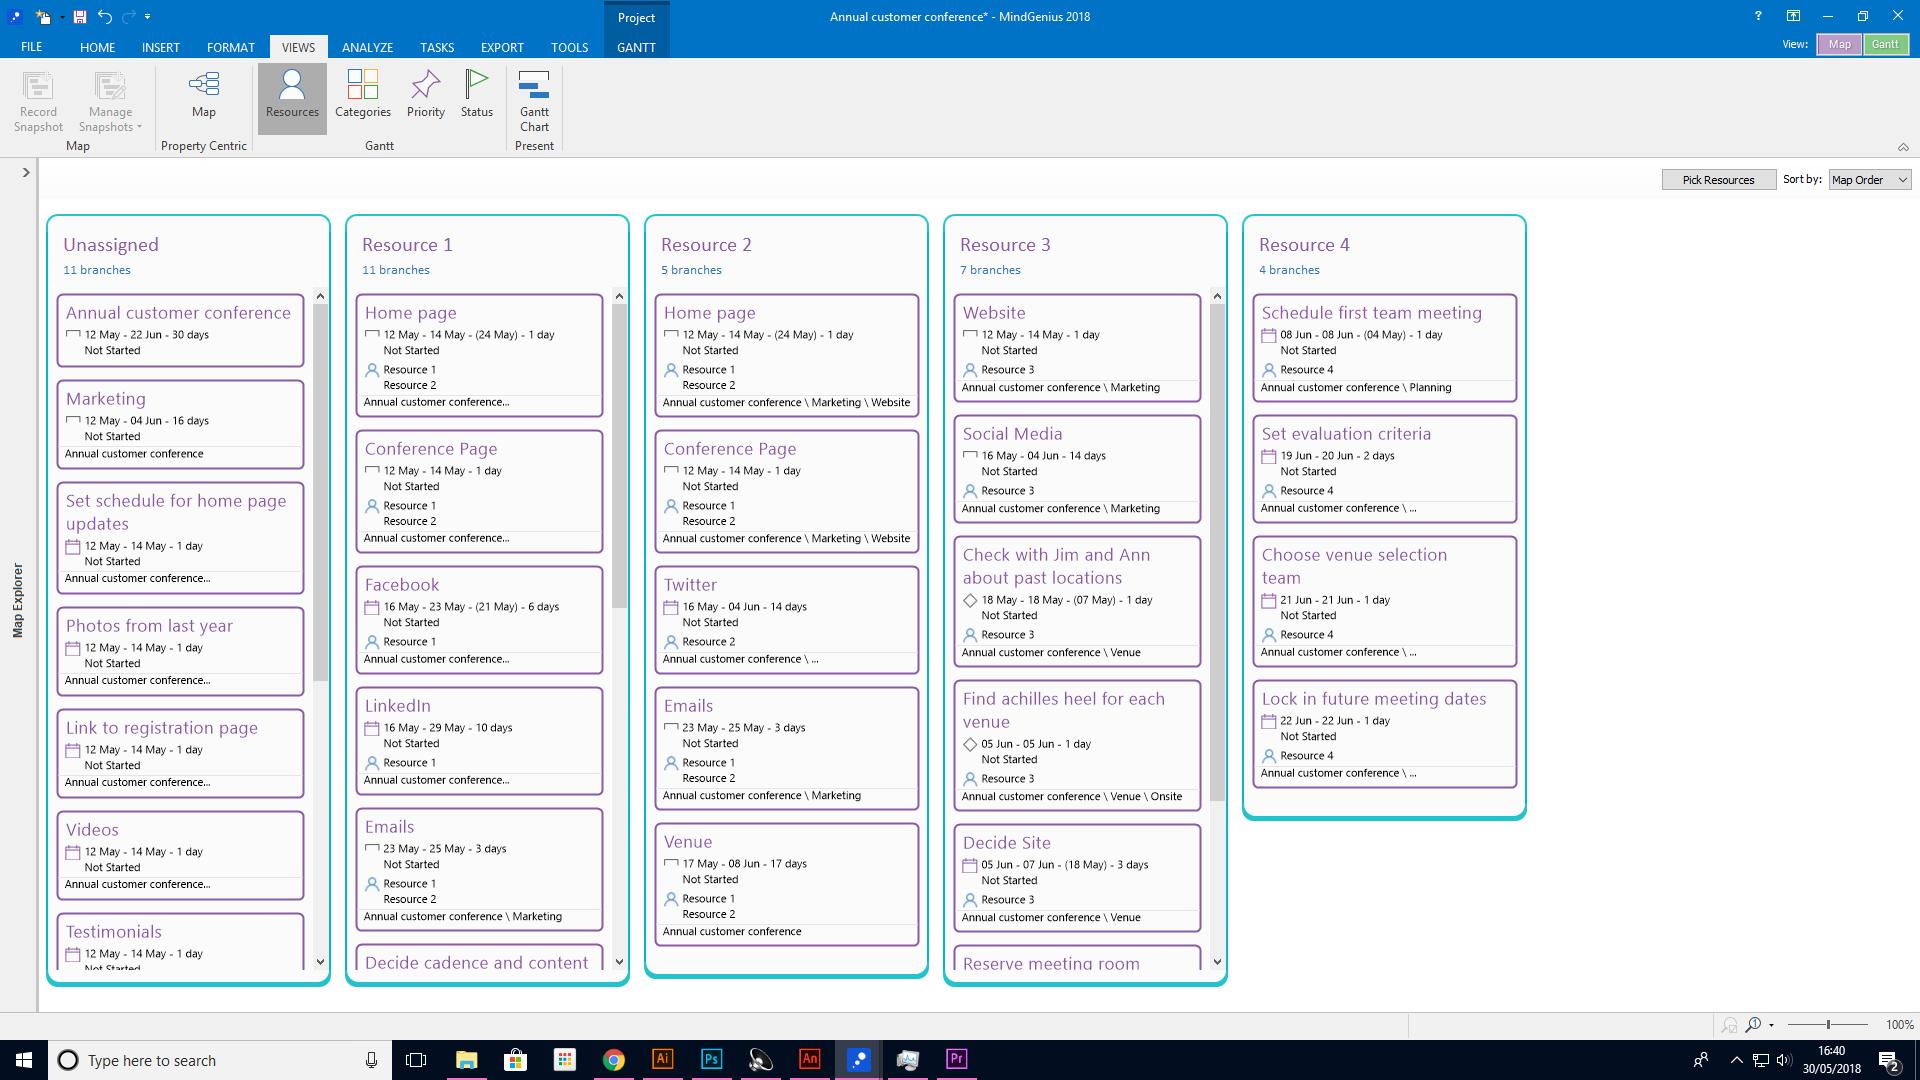 MindGenius Software - Dynamic views